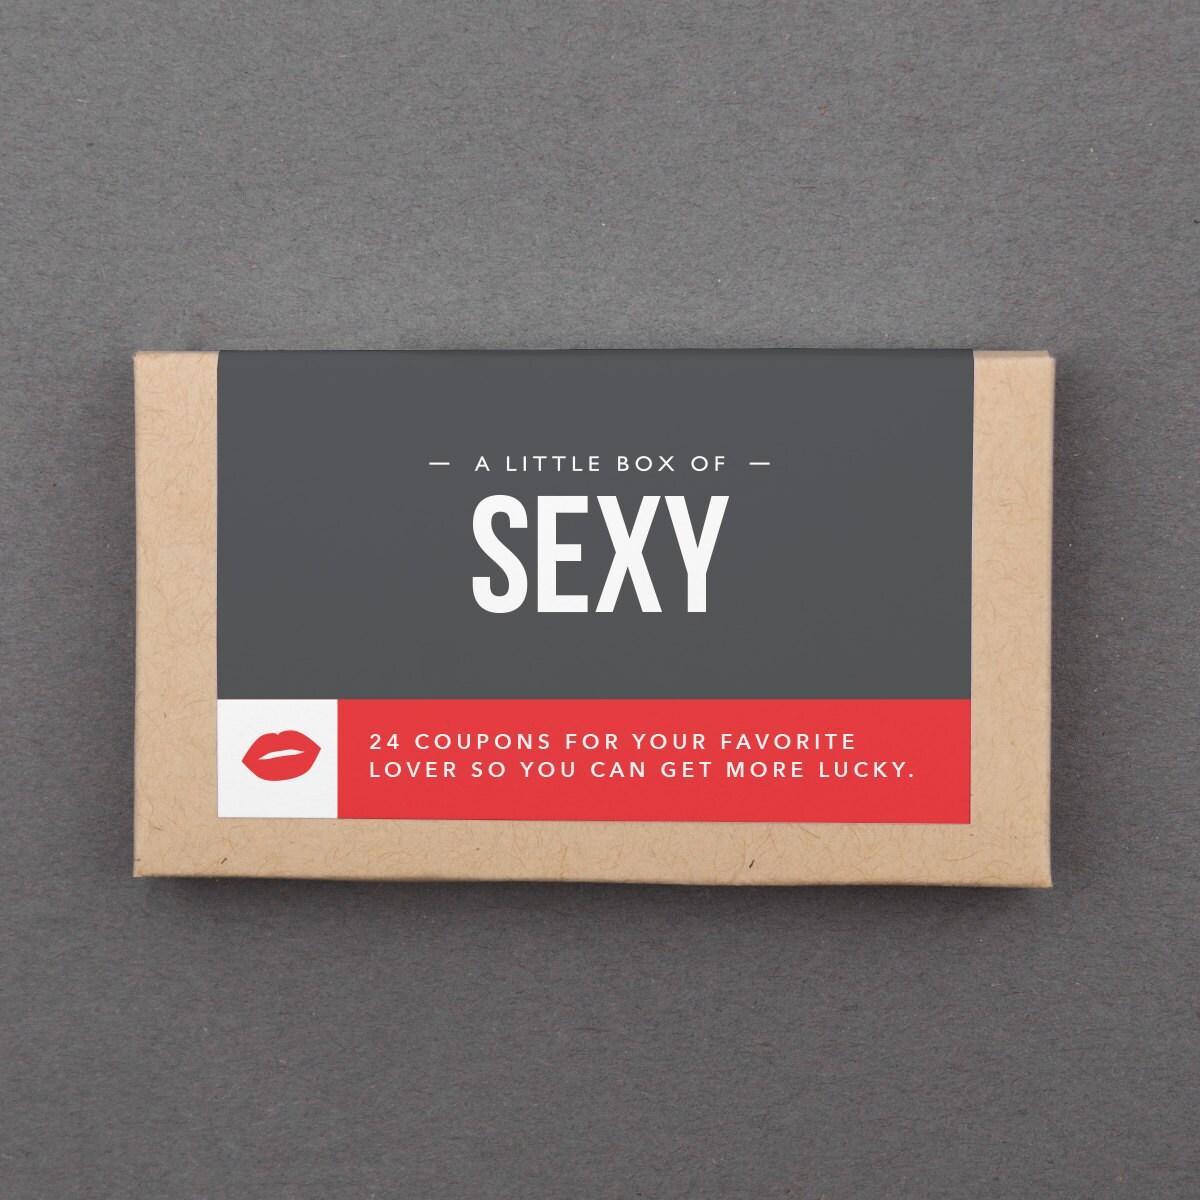 Sexy birthday ideas for husband